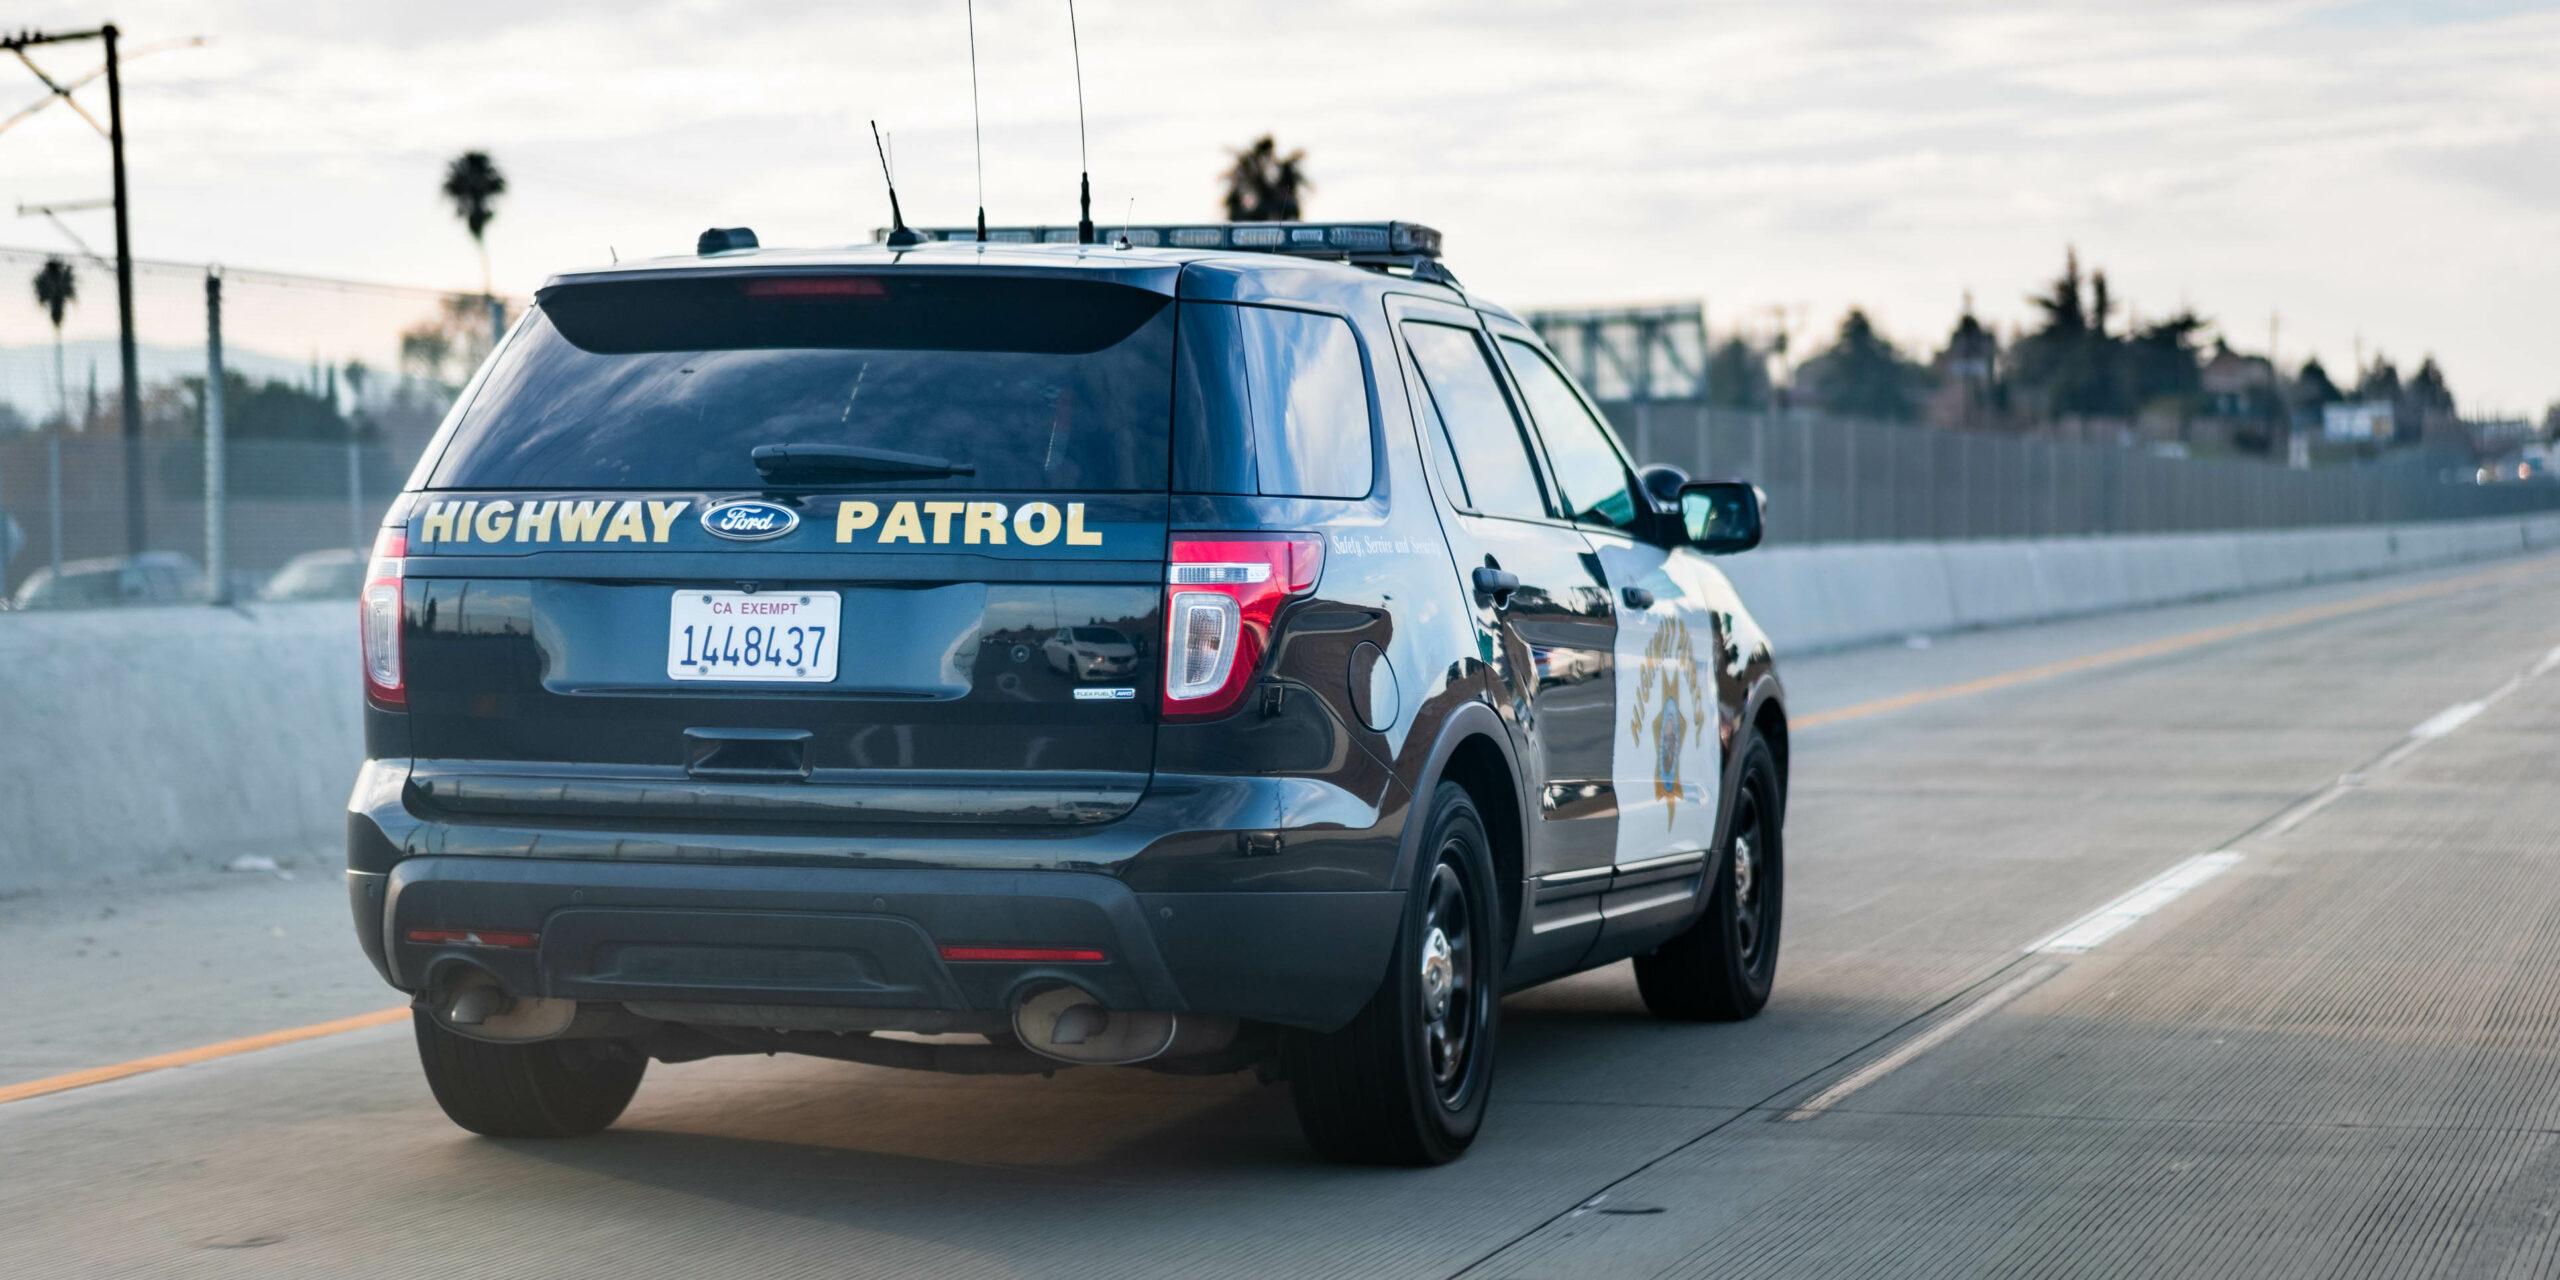 California Highway Patrol vehicle driving on highway